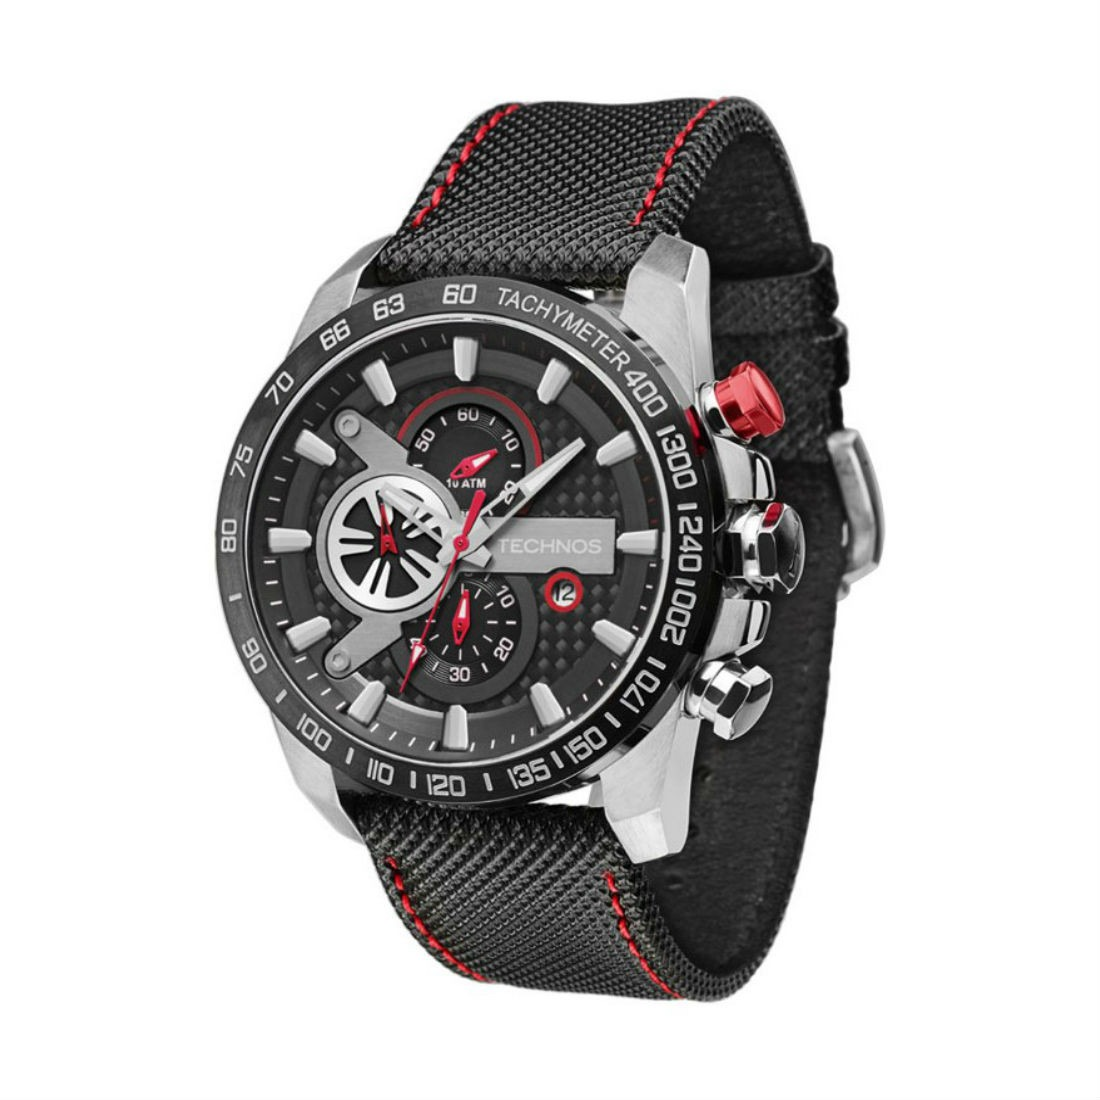 Relógio Technos Masculino Performance Ts Carbon - R  750,00 em ... a16e5ea50c